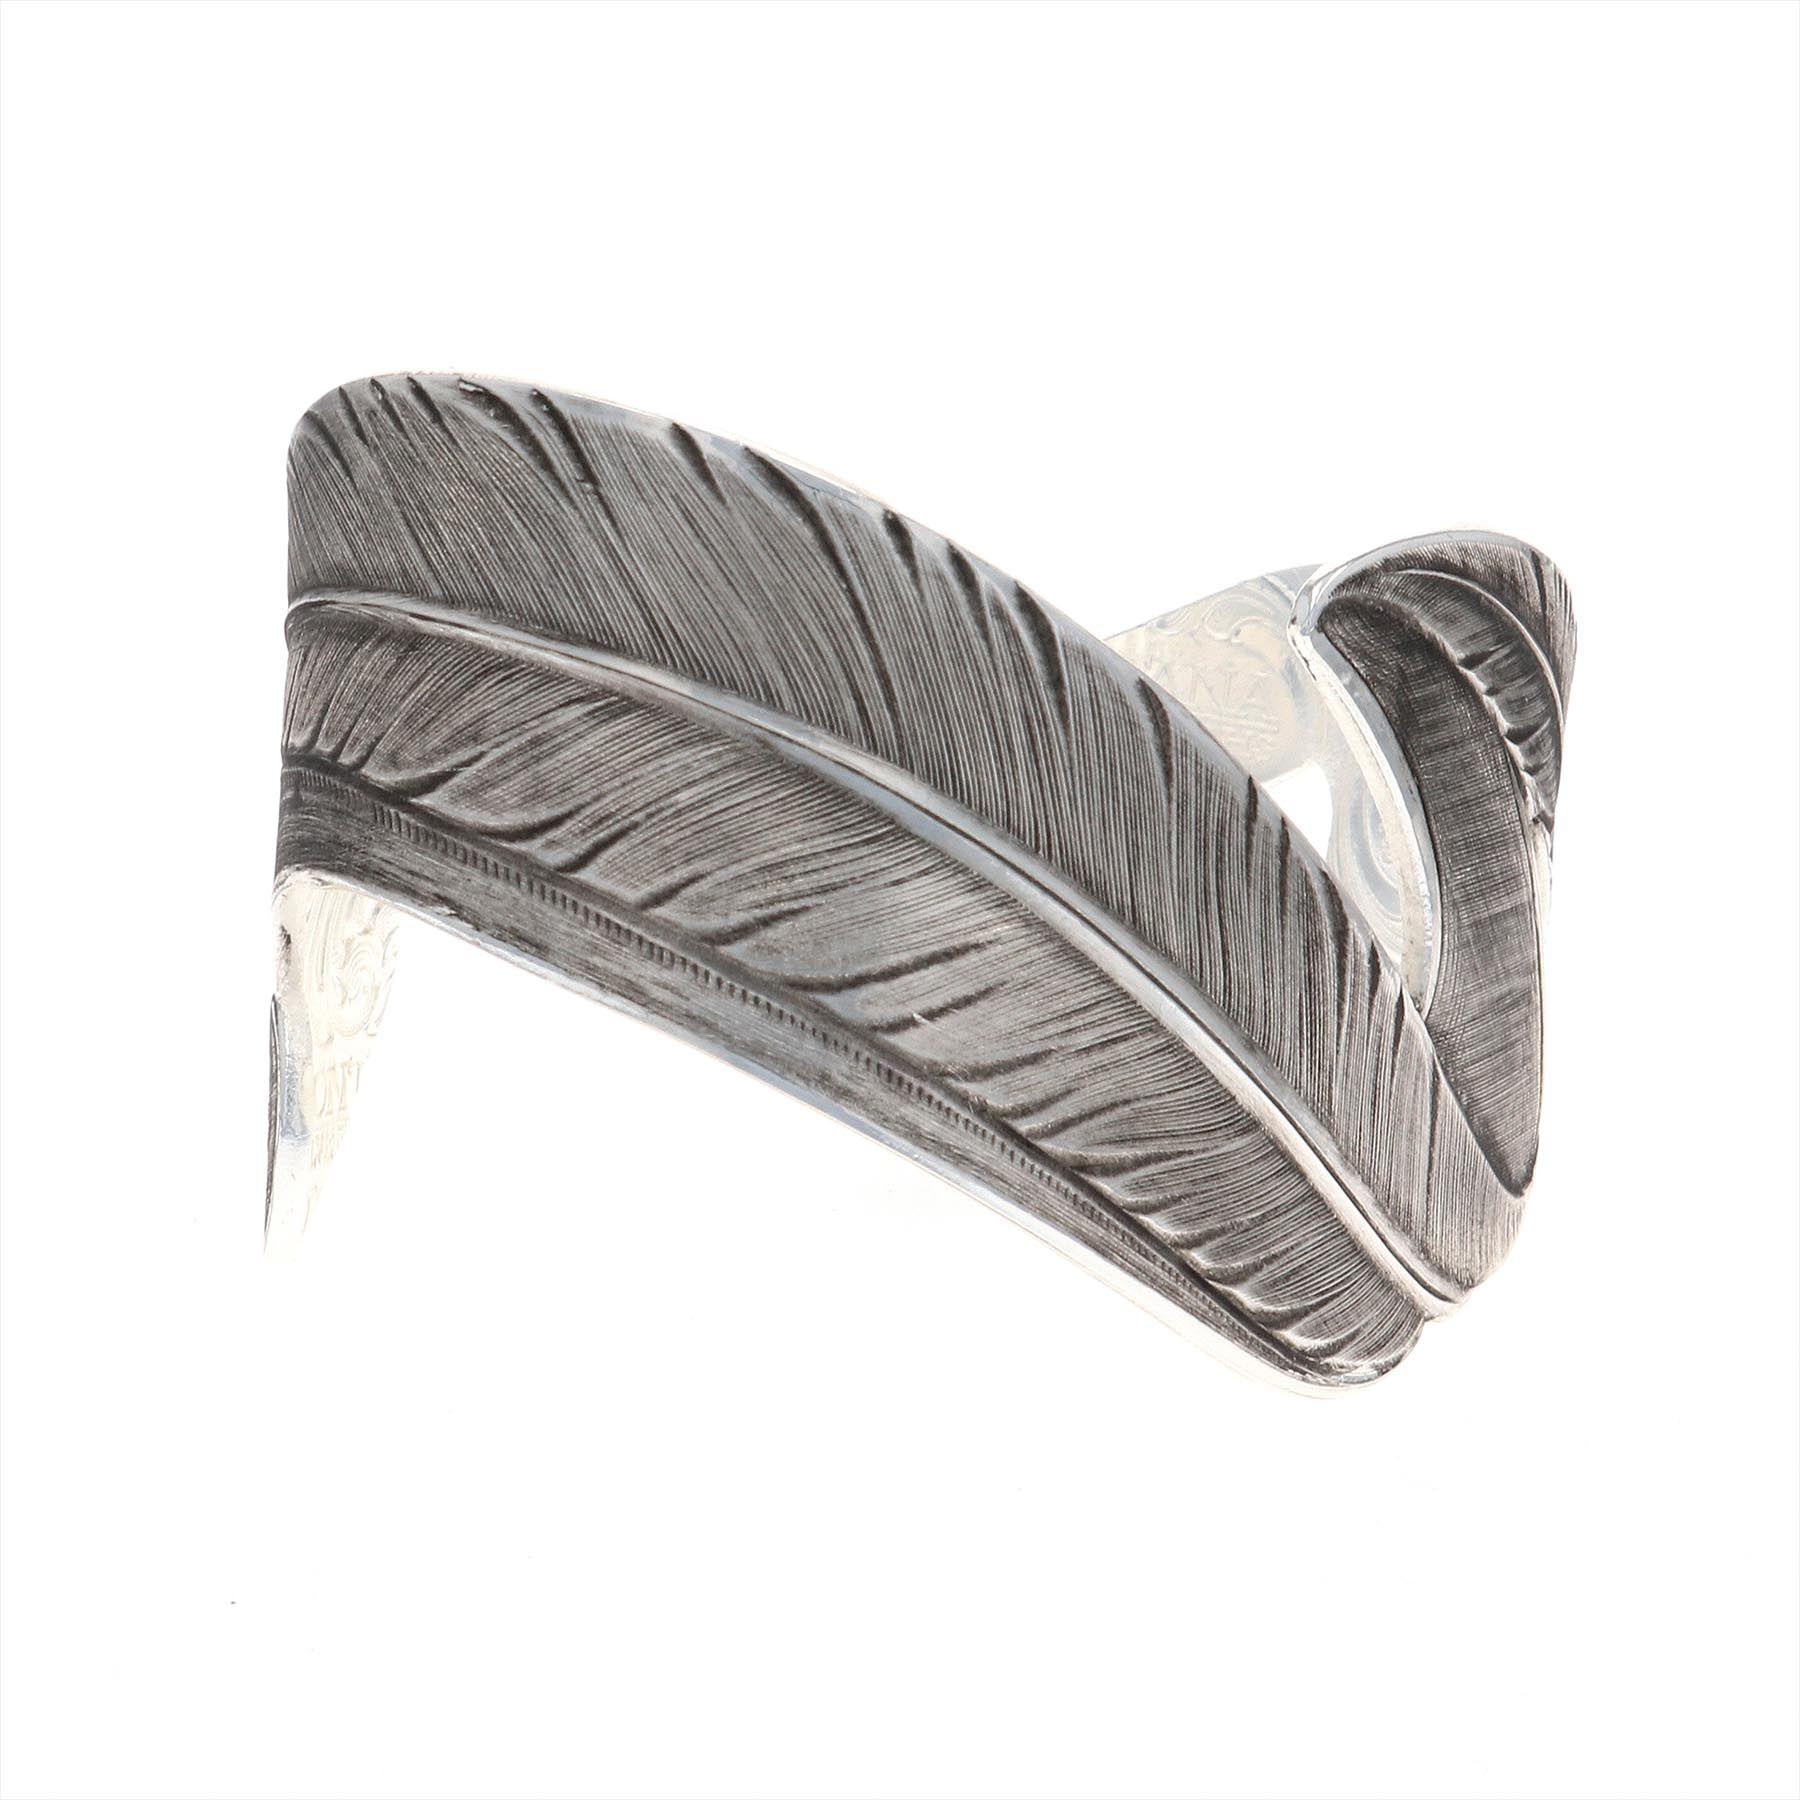 Free Spirit Feather Cuff Bracelet